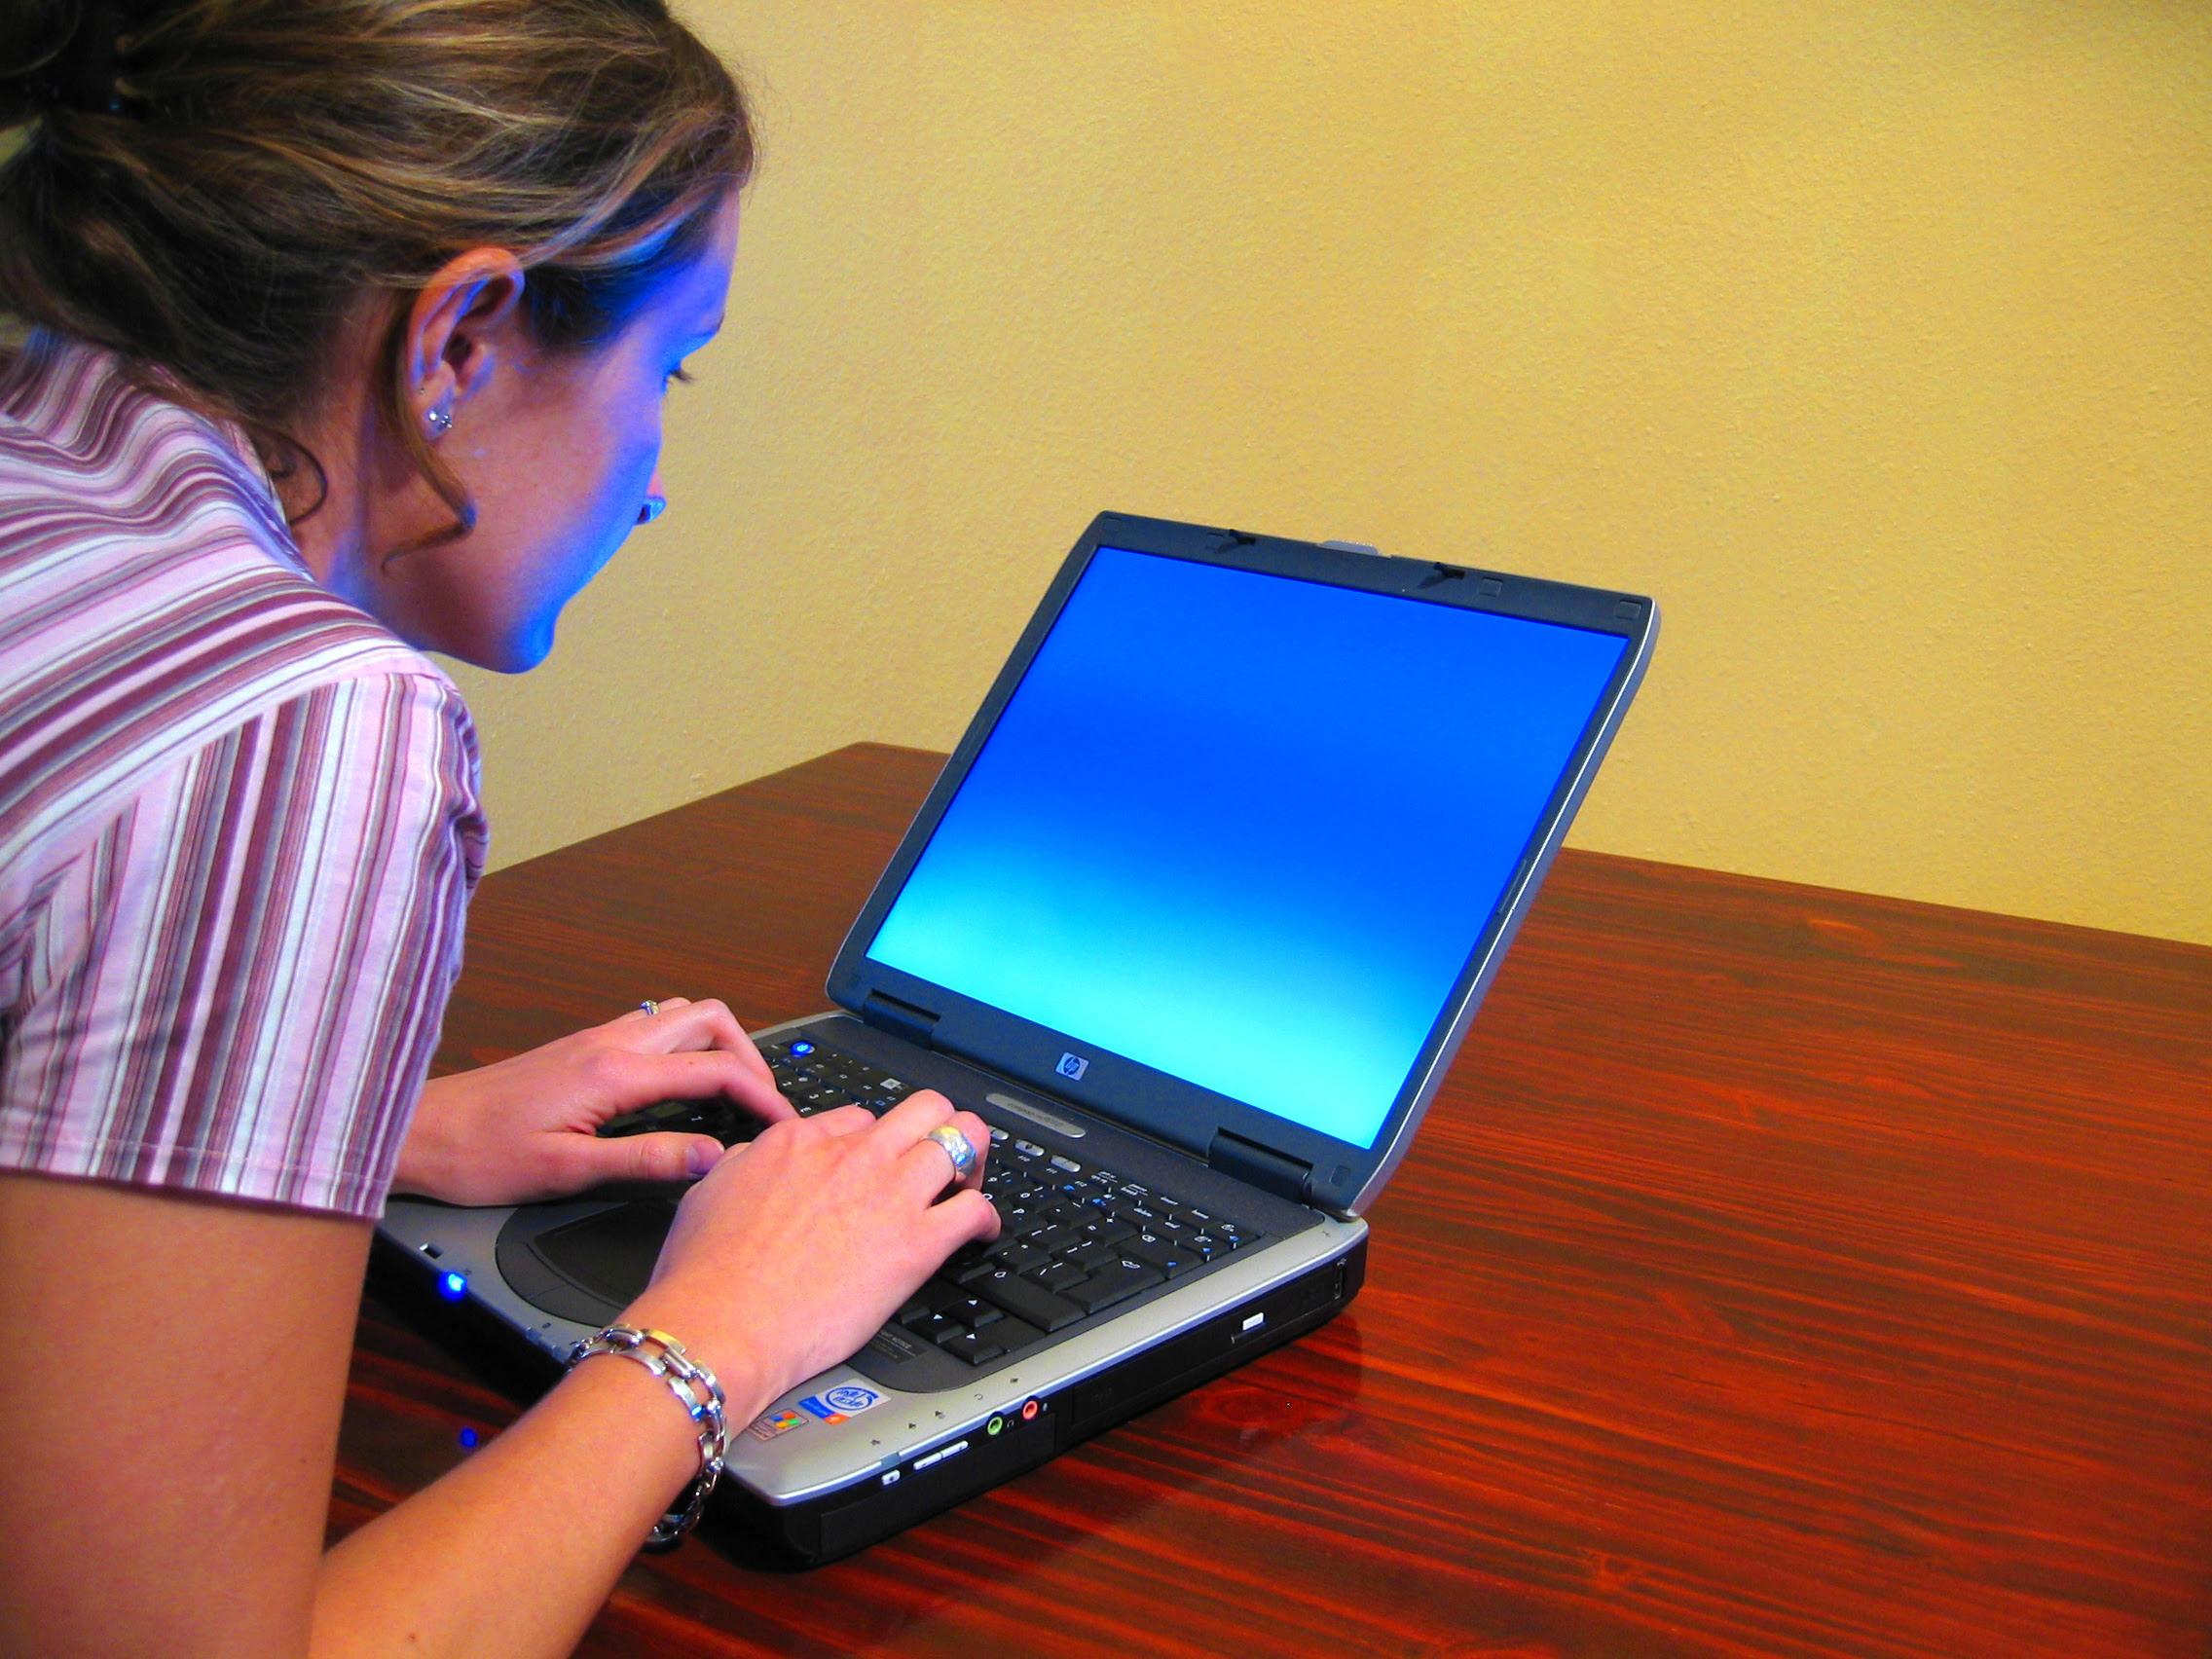 http://thedigitalprofessor.files.wordpress.com/2009/06/woman-typing-on-laptop.jpg